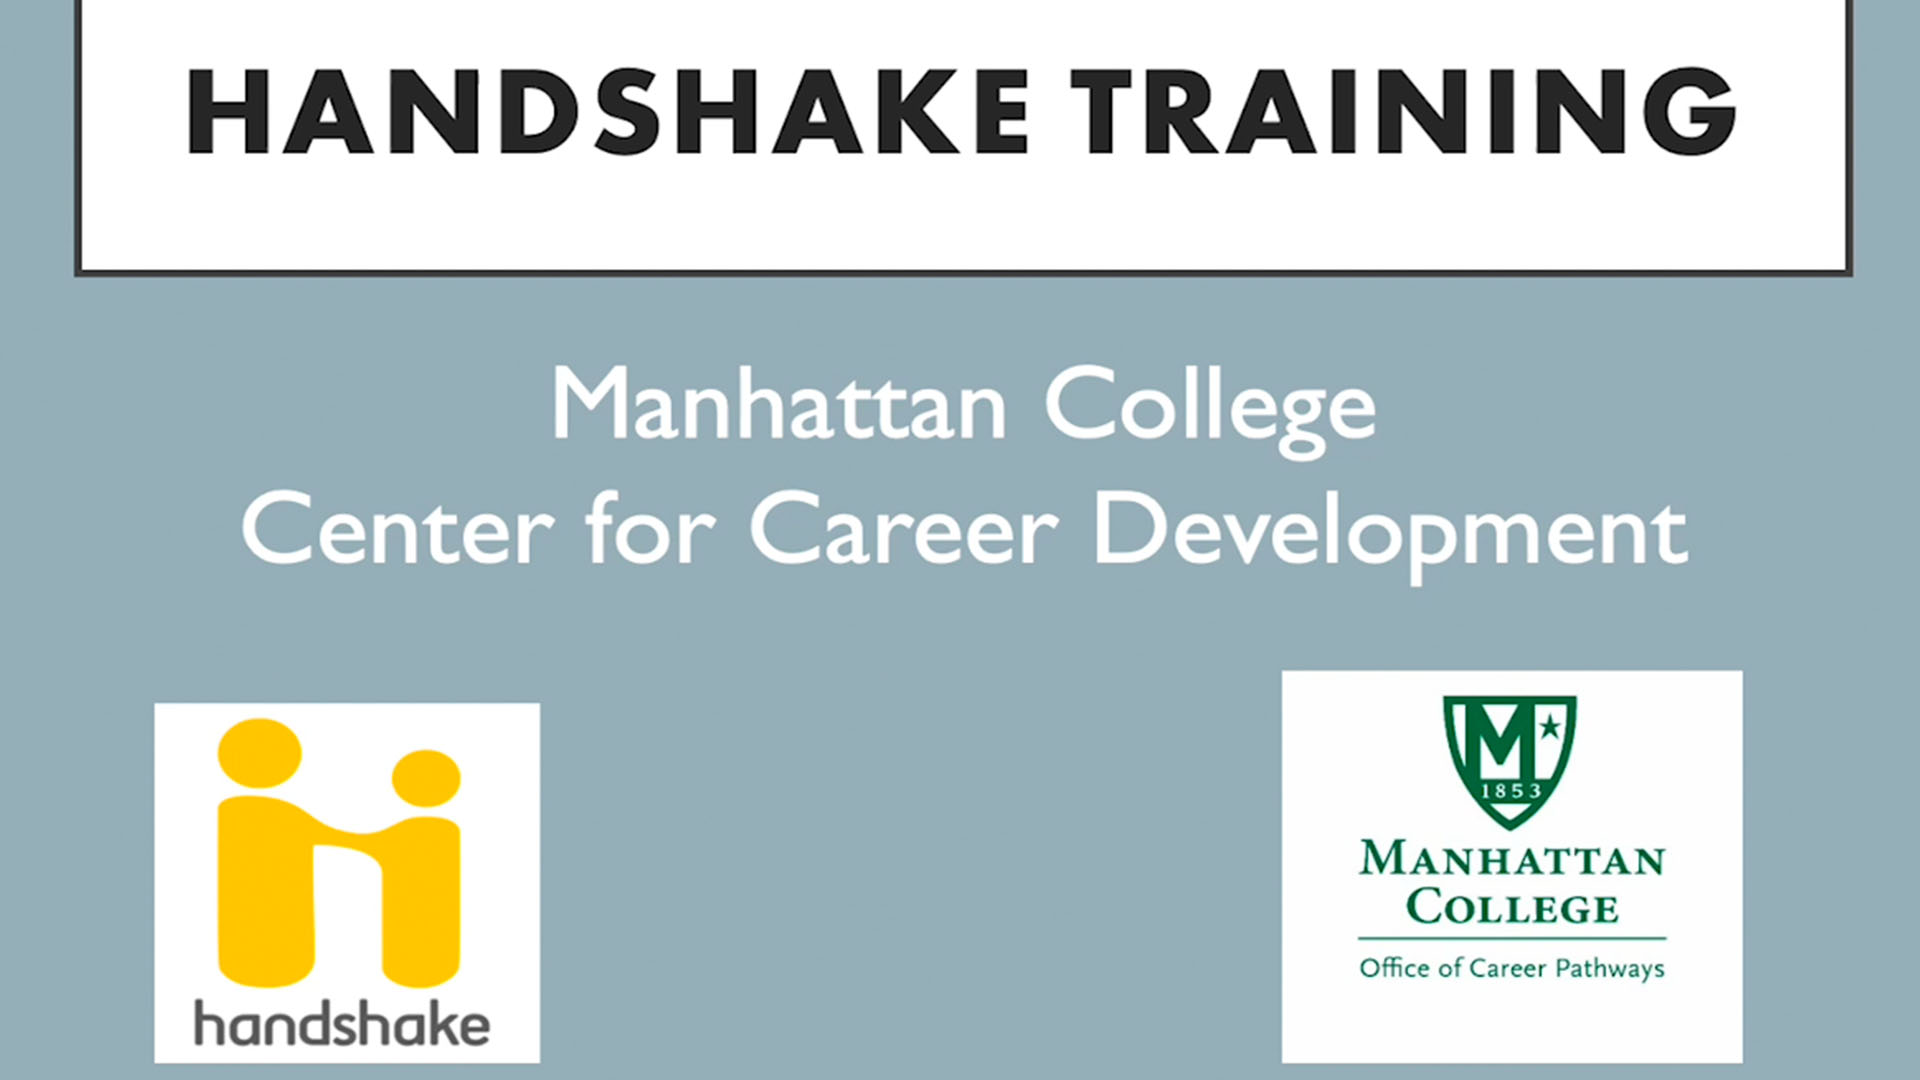 Handshake Training, Manhattan College Center for Career Development